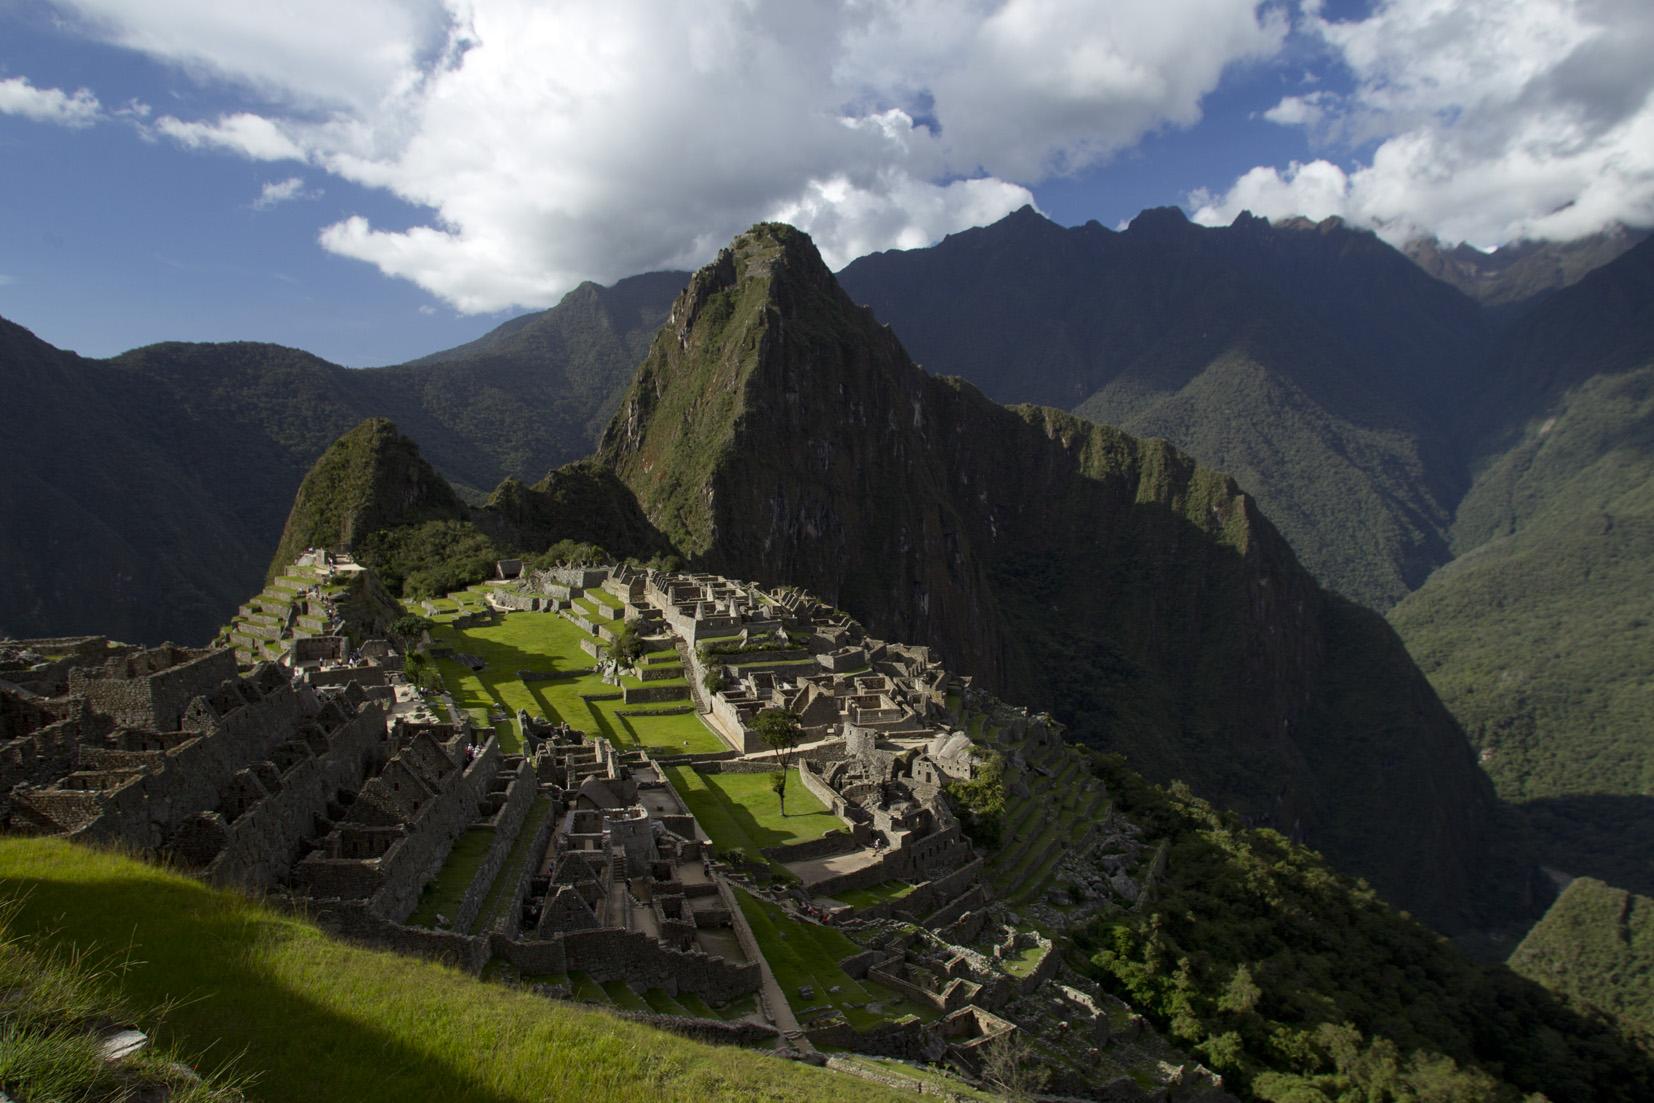 Peru ontvangt vier prijzen op World Travel Awards Zuid-Amerika 2019